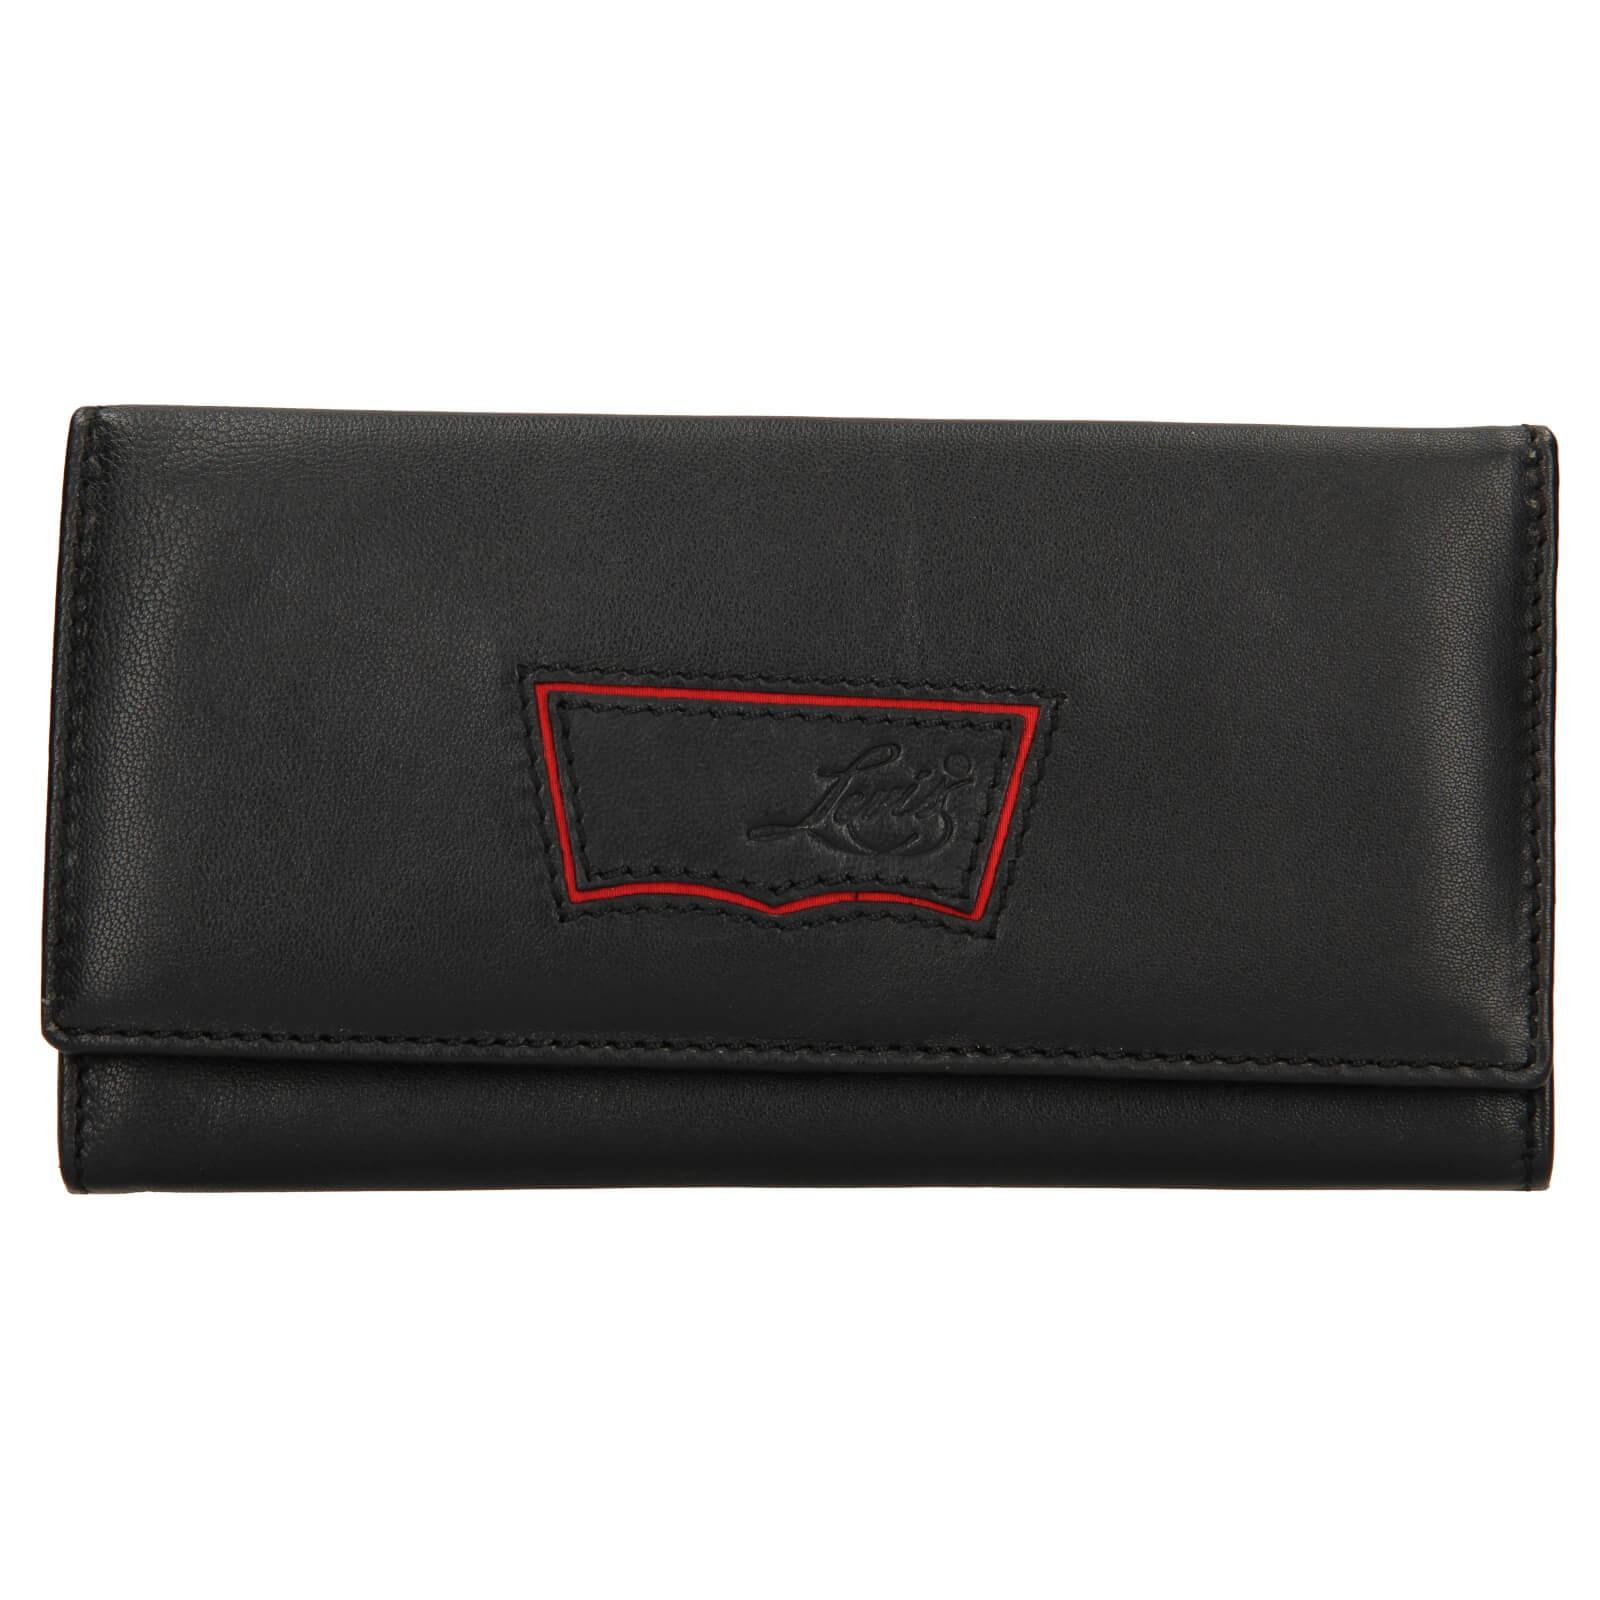 Dámska kožená peňaženka Levis Madison - čierna.